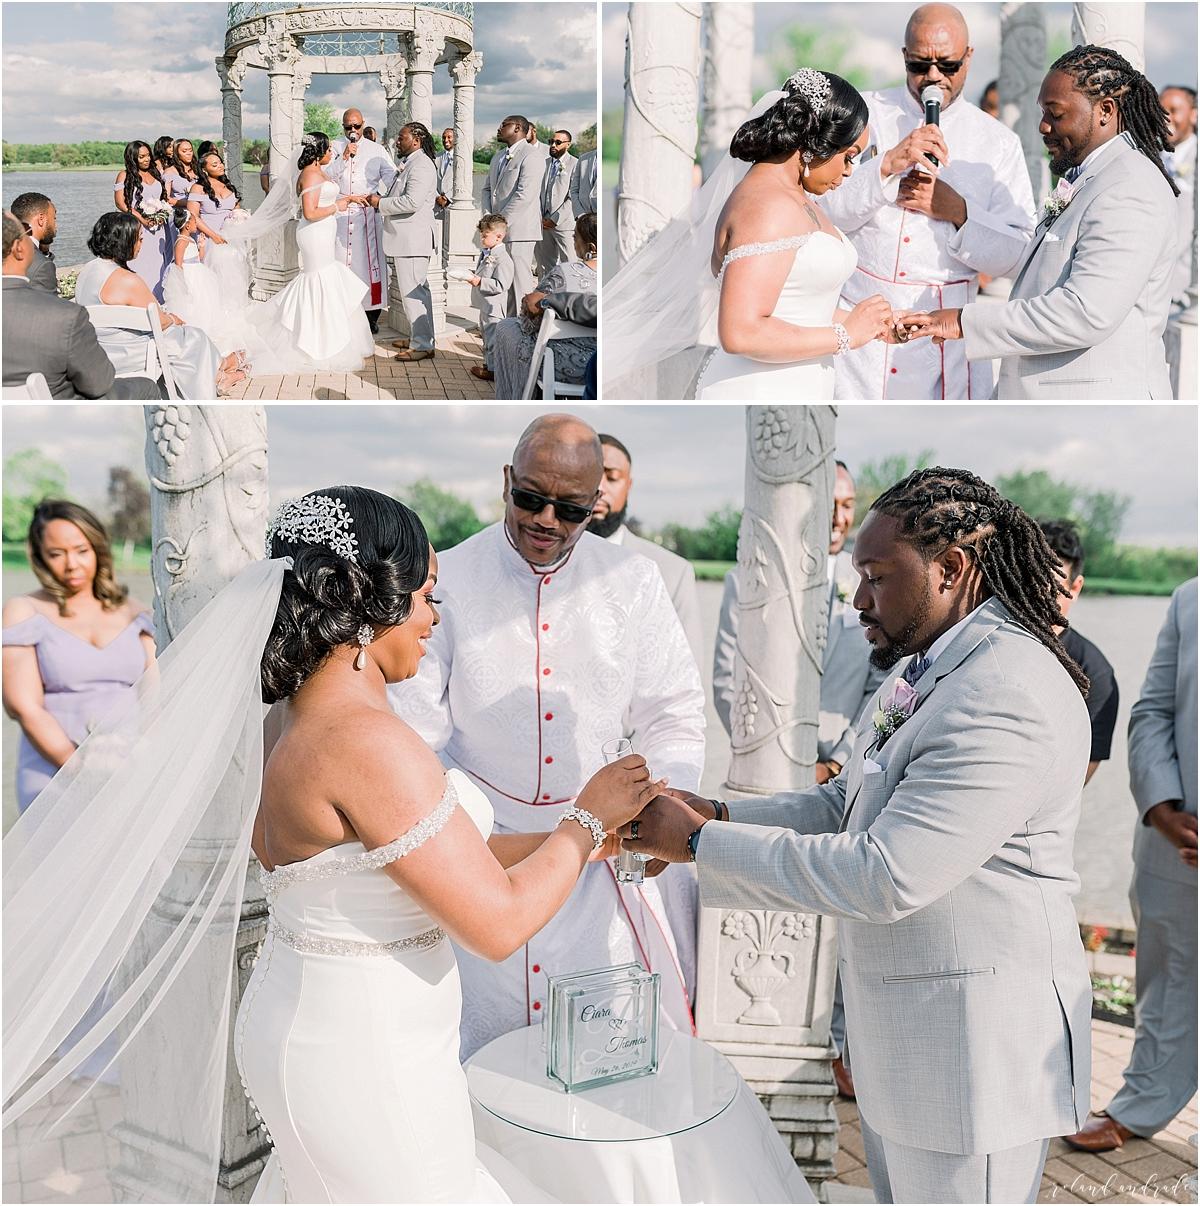 The Odyssey Wedding, Tinley Park Wedding, Chicago Wedding Photographer, Best Photographer In Tineley Park, Best Photographer In Chicago, Light And Airy Photographer_0044.jpg